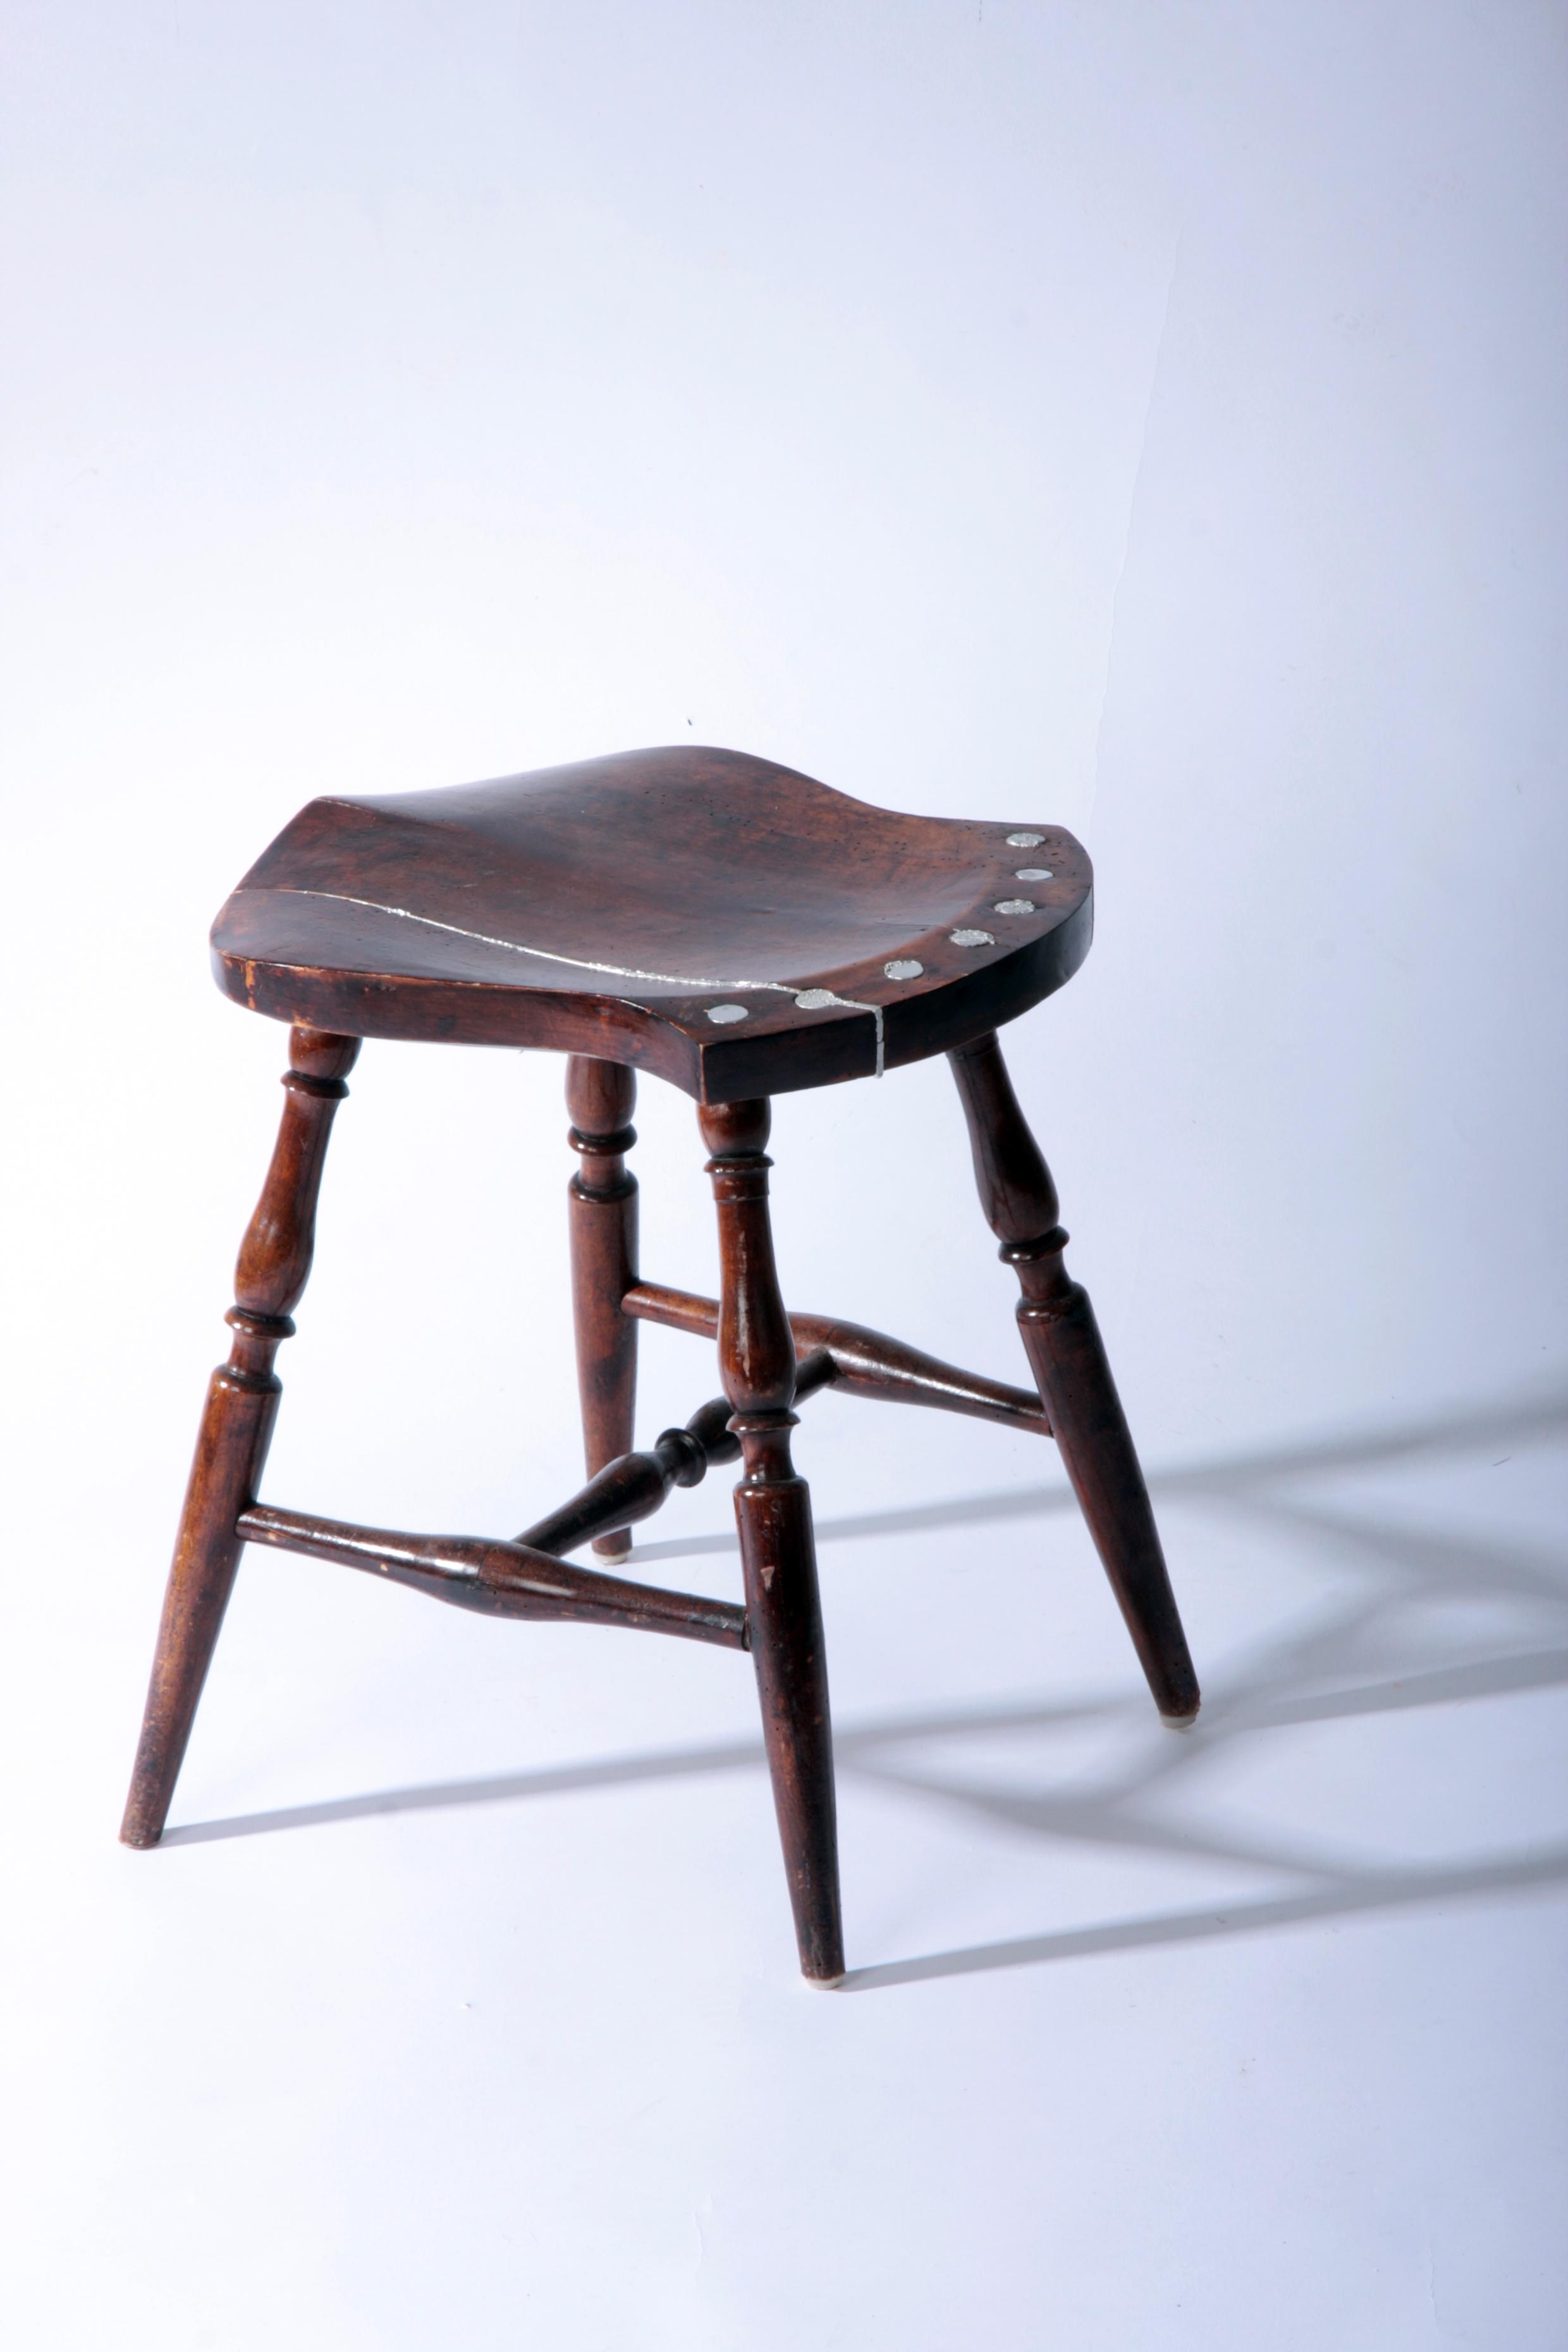 The brown chair.jpg